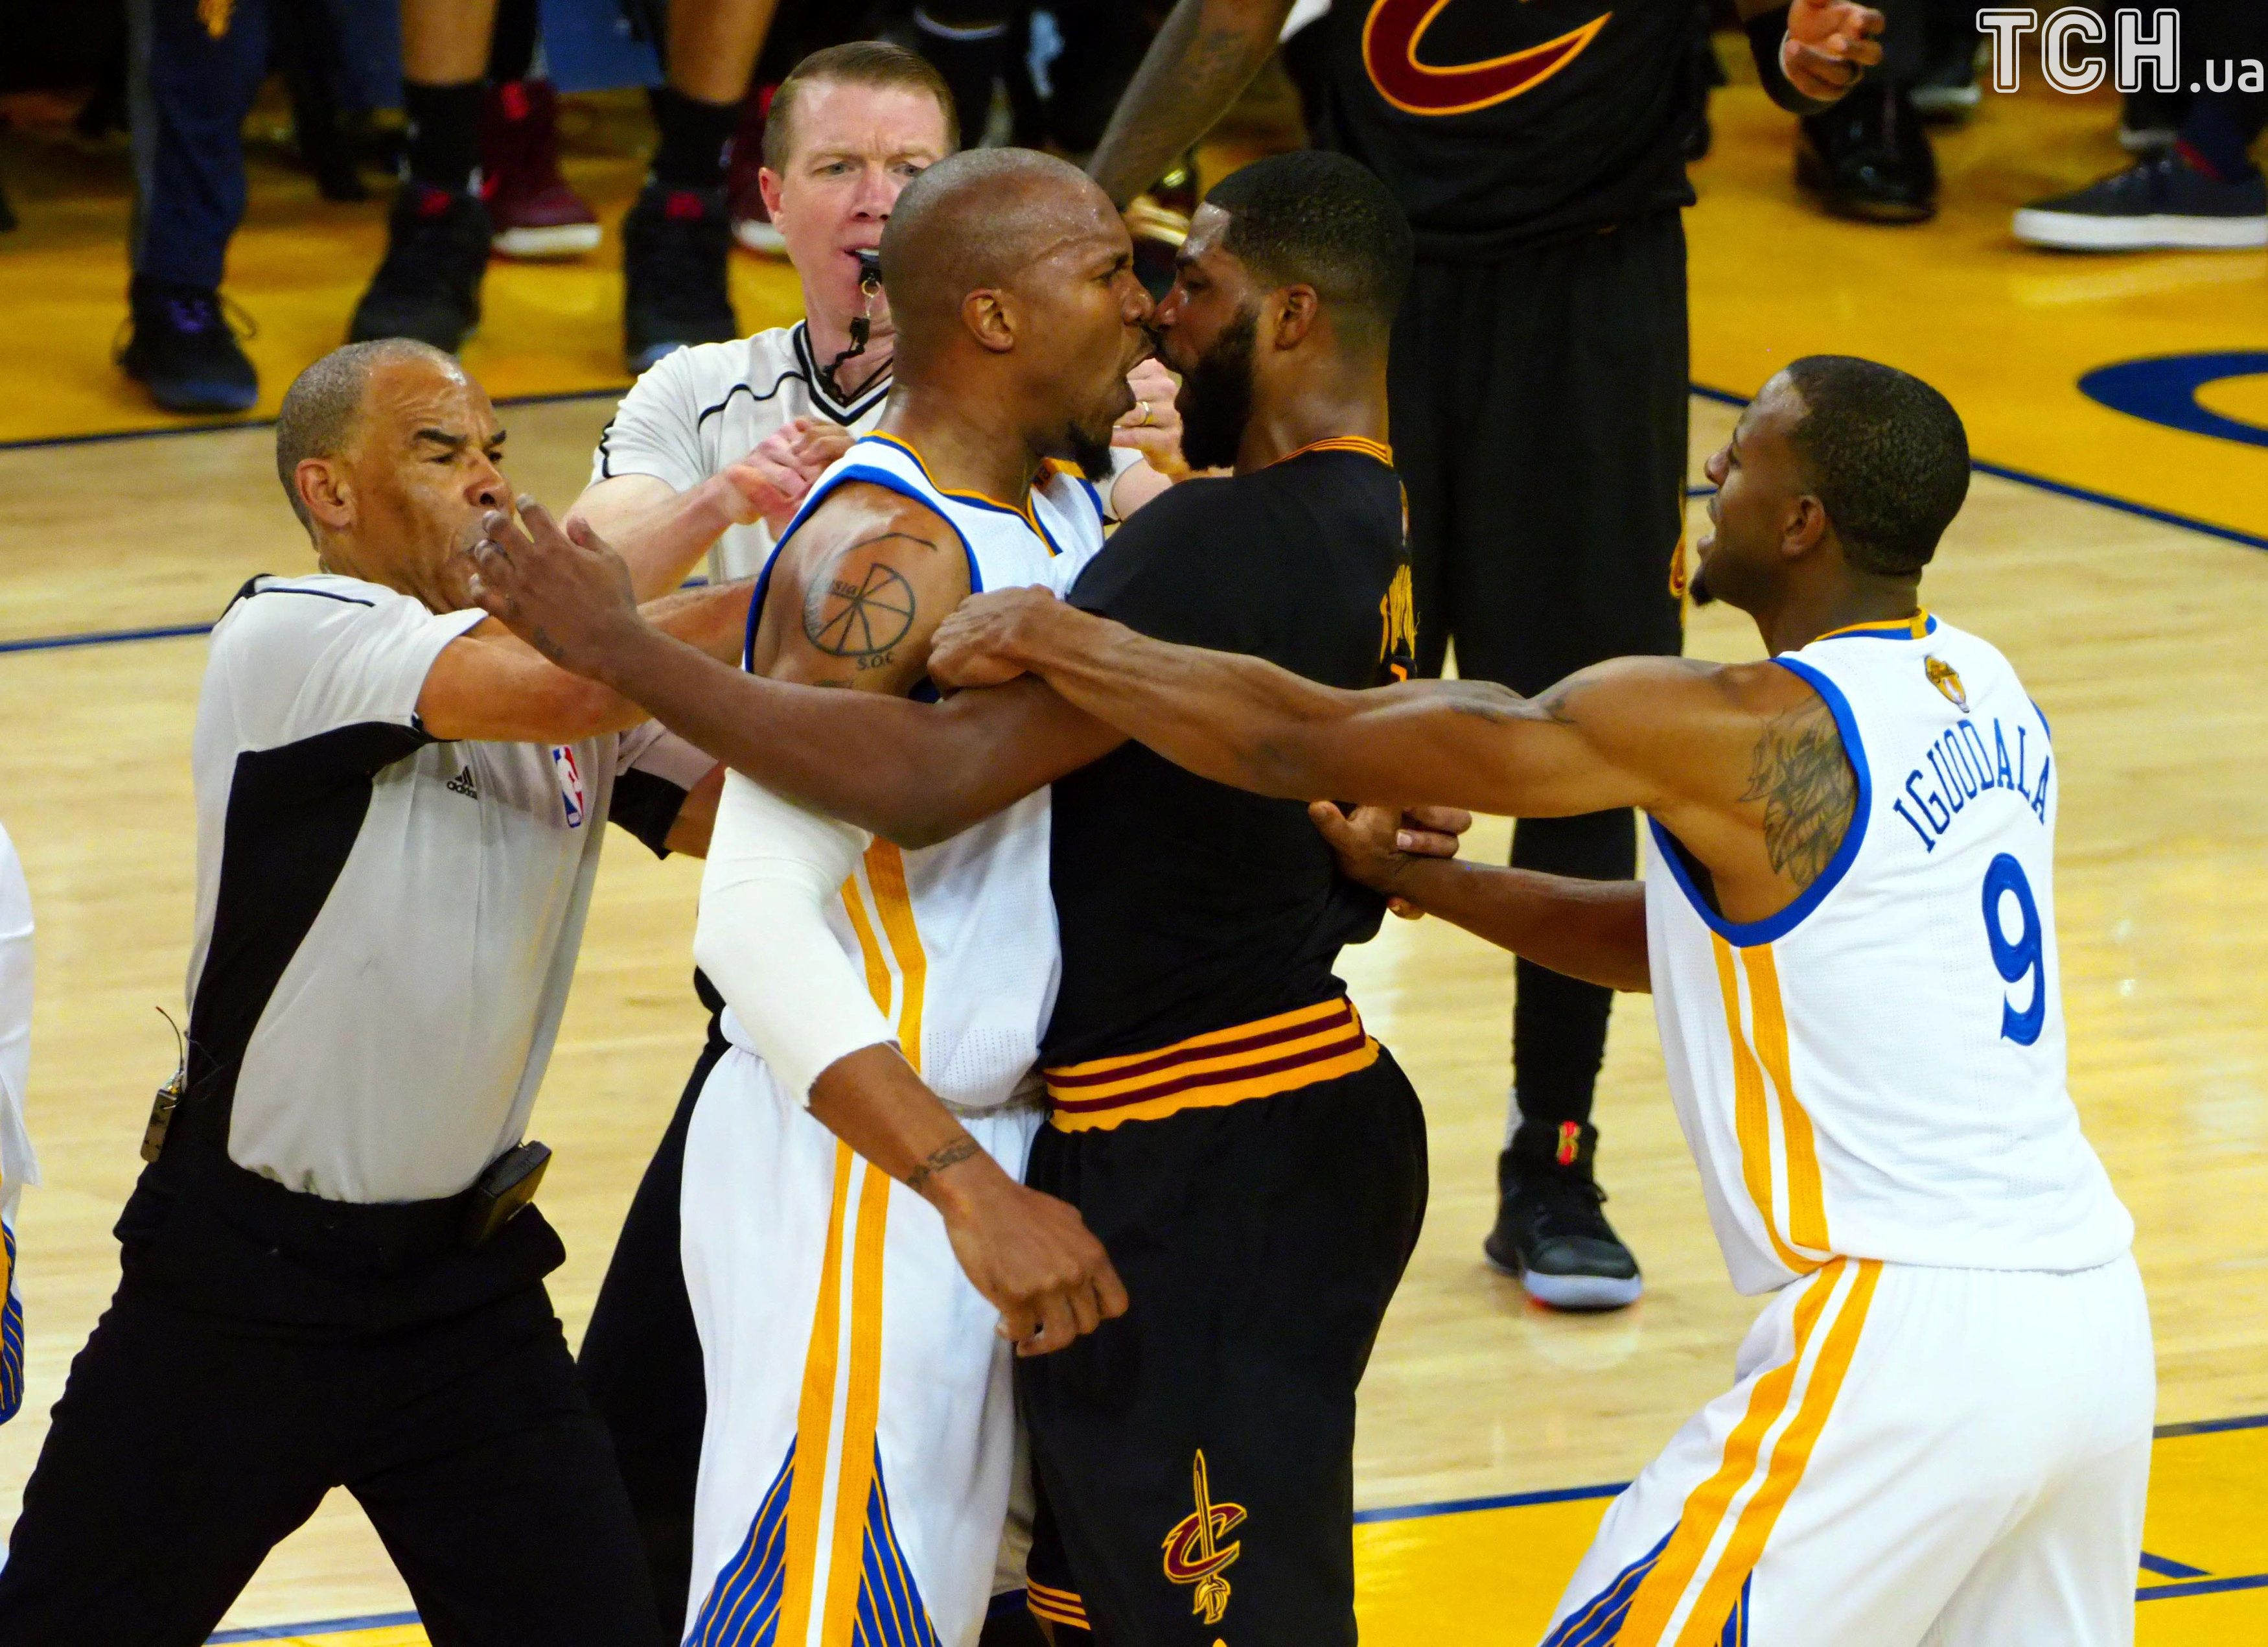 «Голден Стейт» вп'яте став чемпіоном НБА